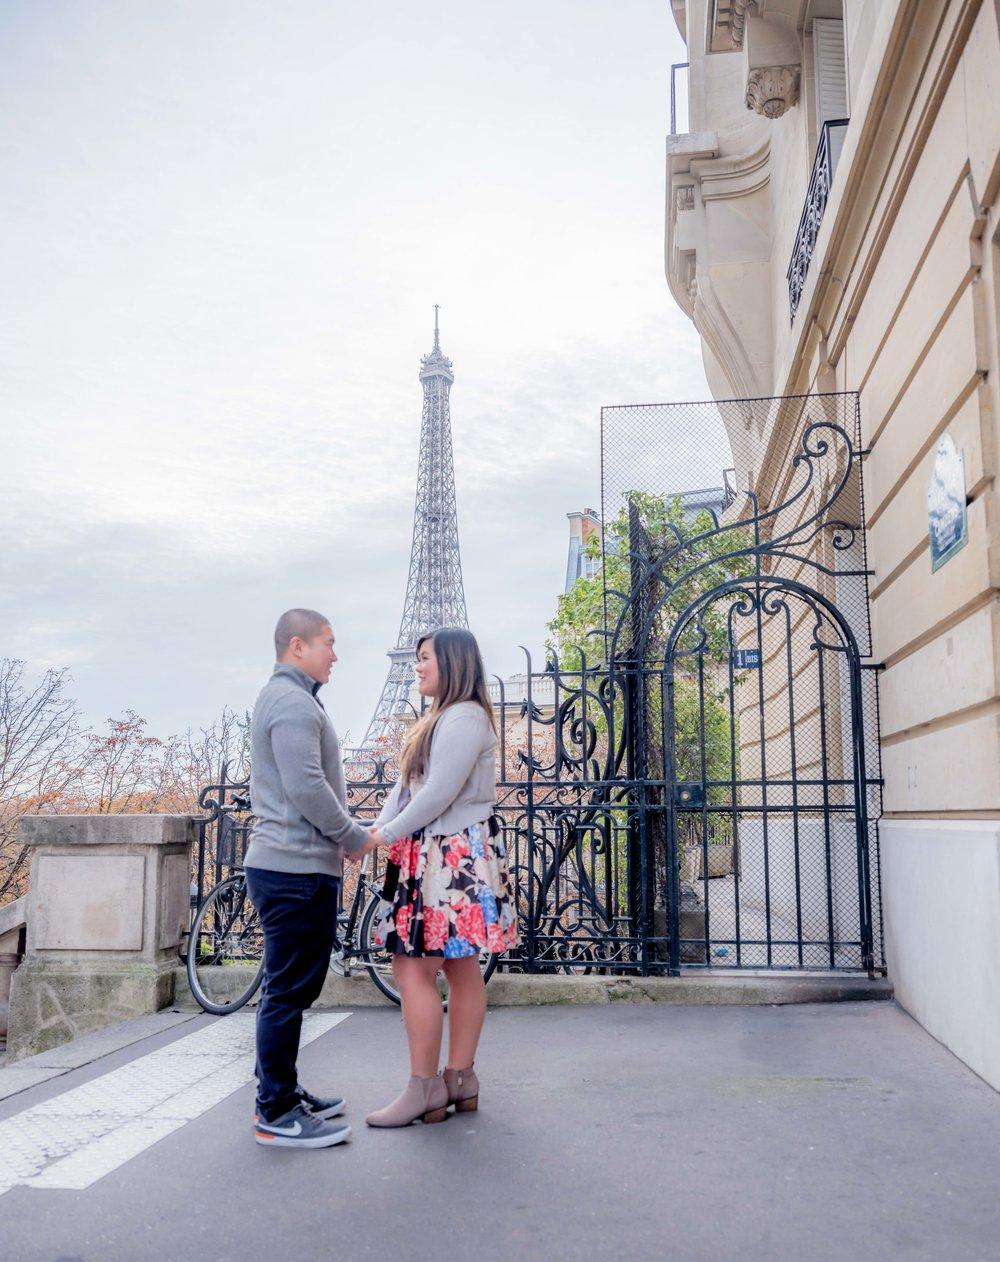 honeymooning couple at eiffel tower paris